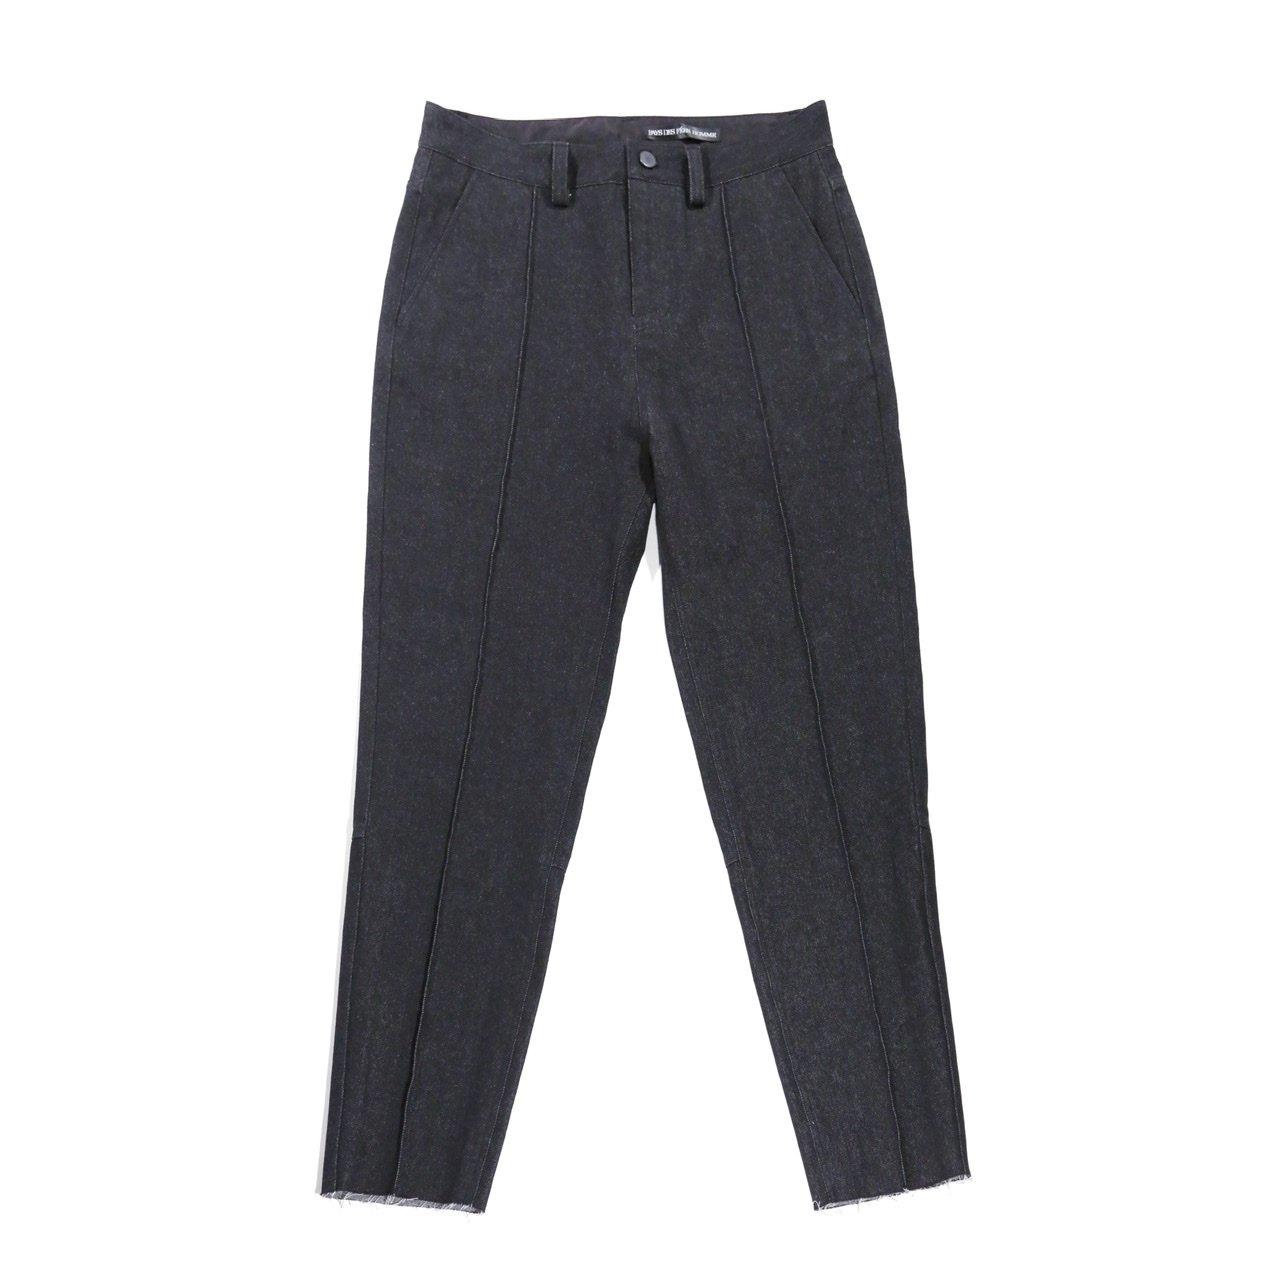 Black denim tapered pants